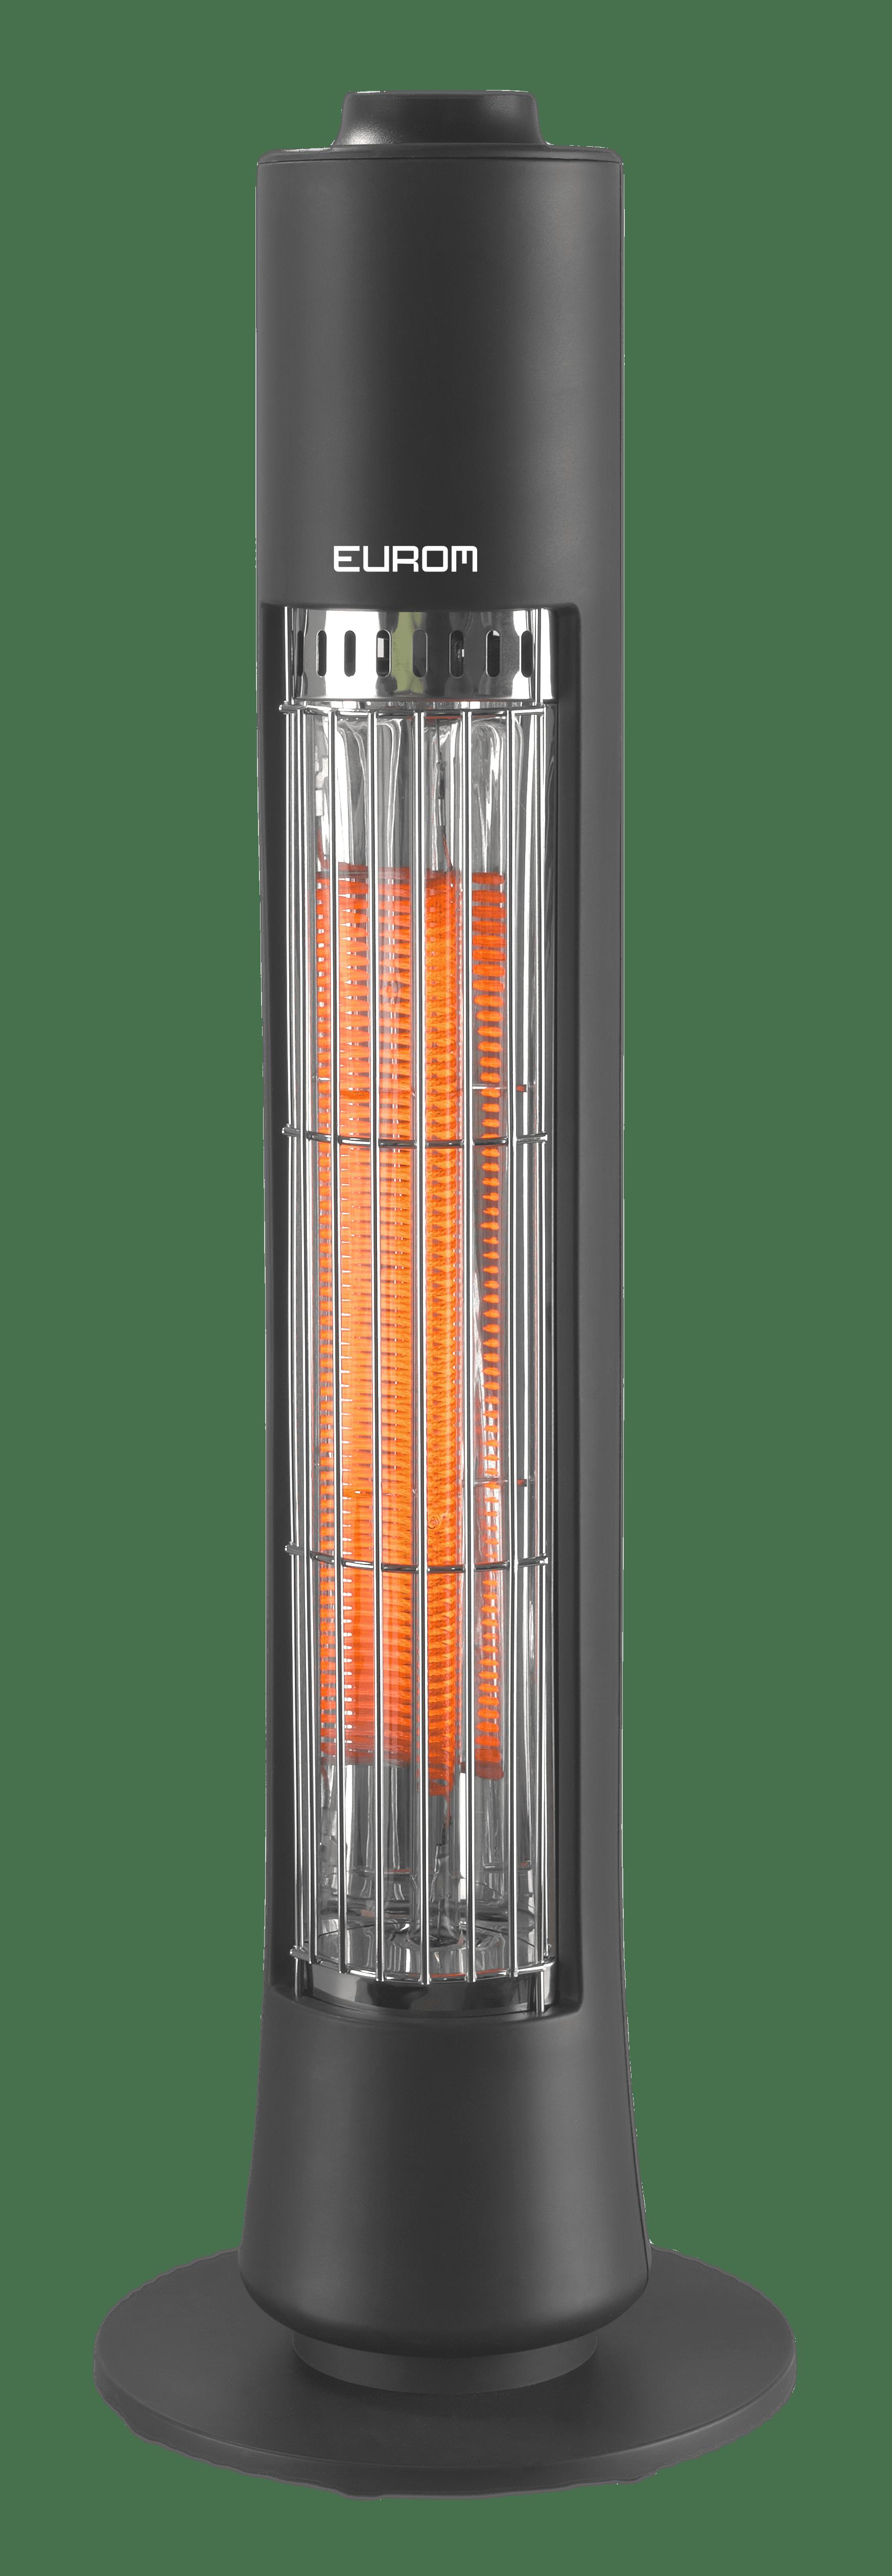 Solus 400 electrische kachel